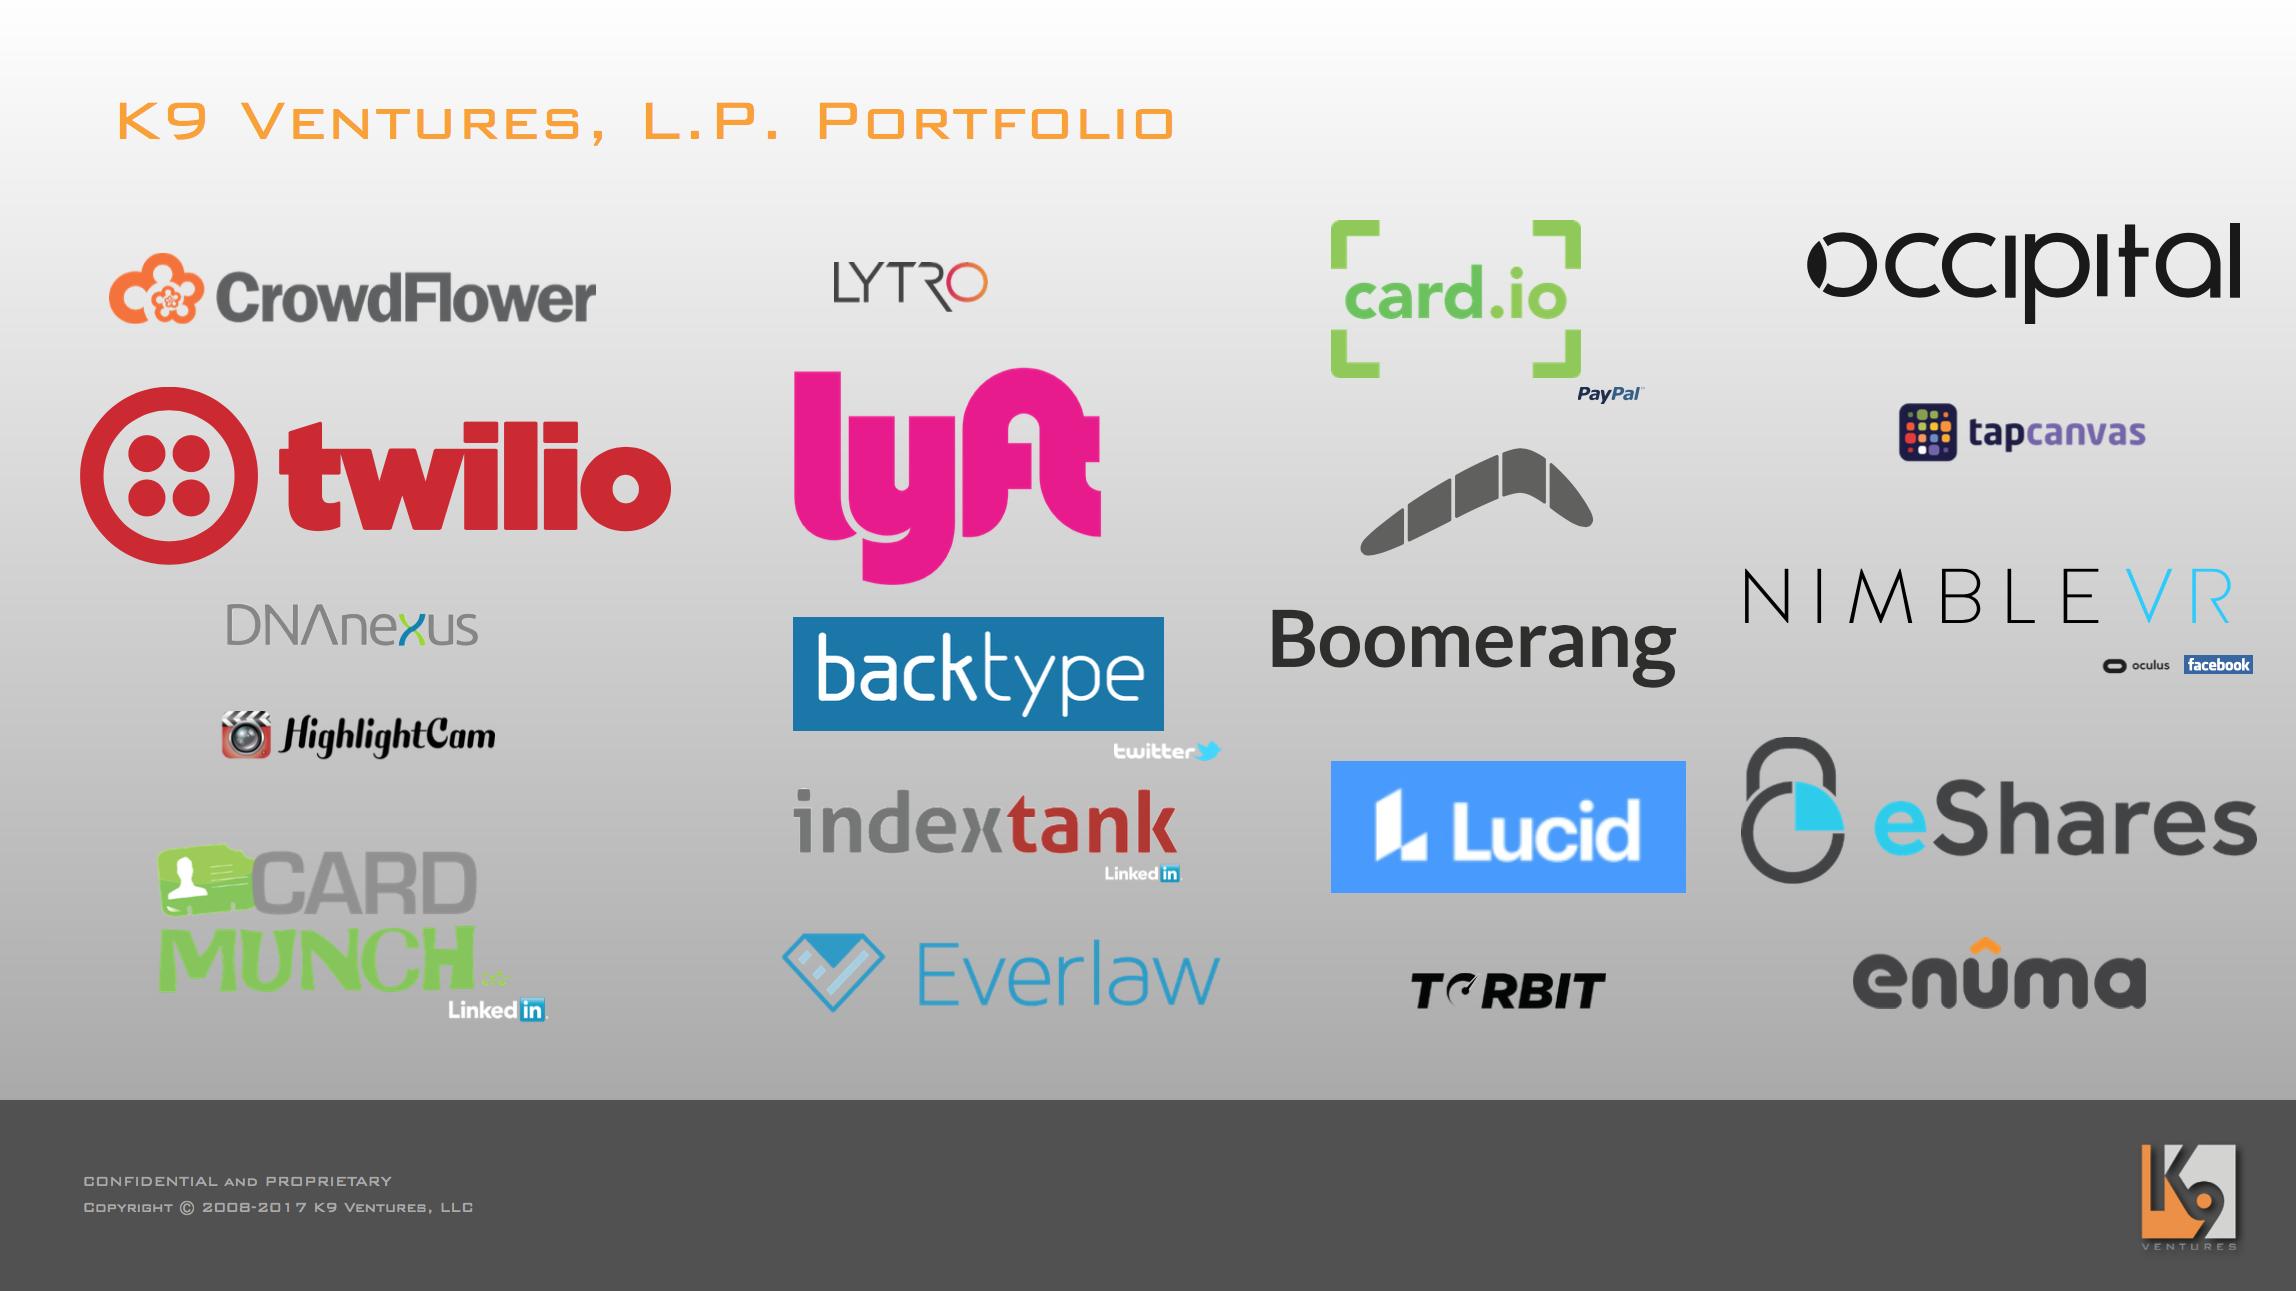 K9 Ventures, L.P. Portfolio Companies: CrowdFlower, Twilio, DNAnexus, HighlightCam, CardMunch, Lytro, Lyft, BackType, IndexTank, Everlaw, card.io, Boomerang, Lucid Software, Torbit, Occipital, TapCanvas, NimbleVR, eShares, Enuma